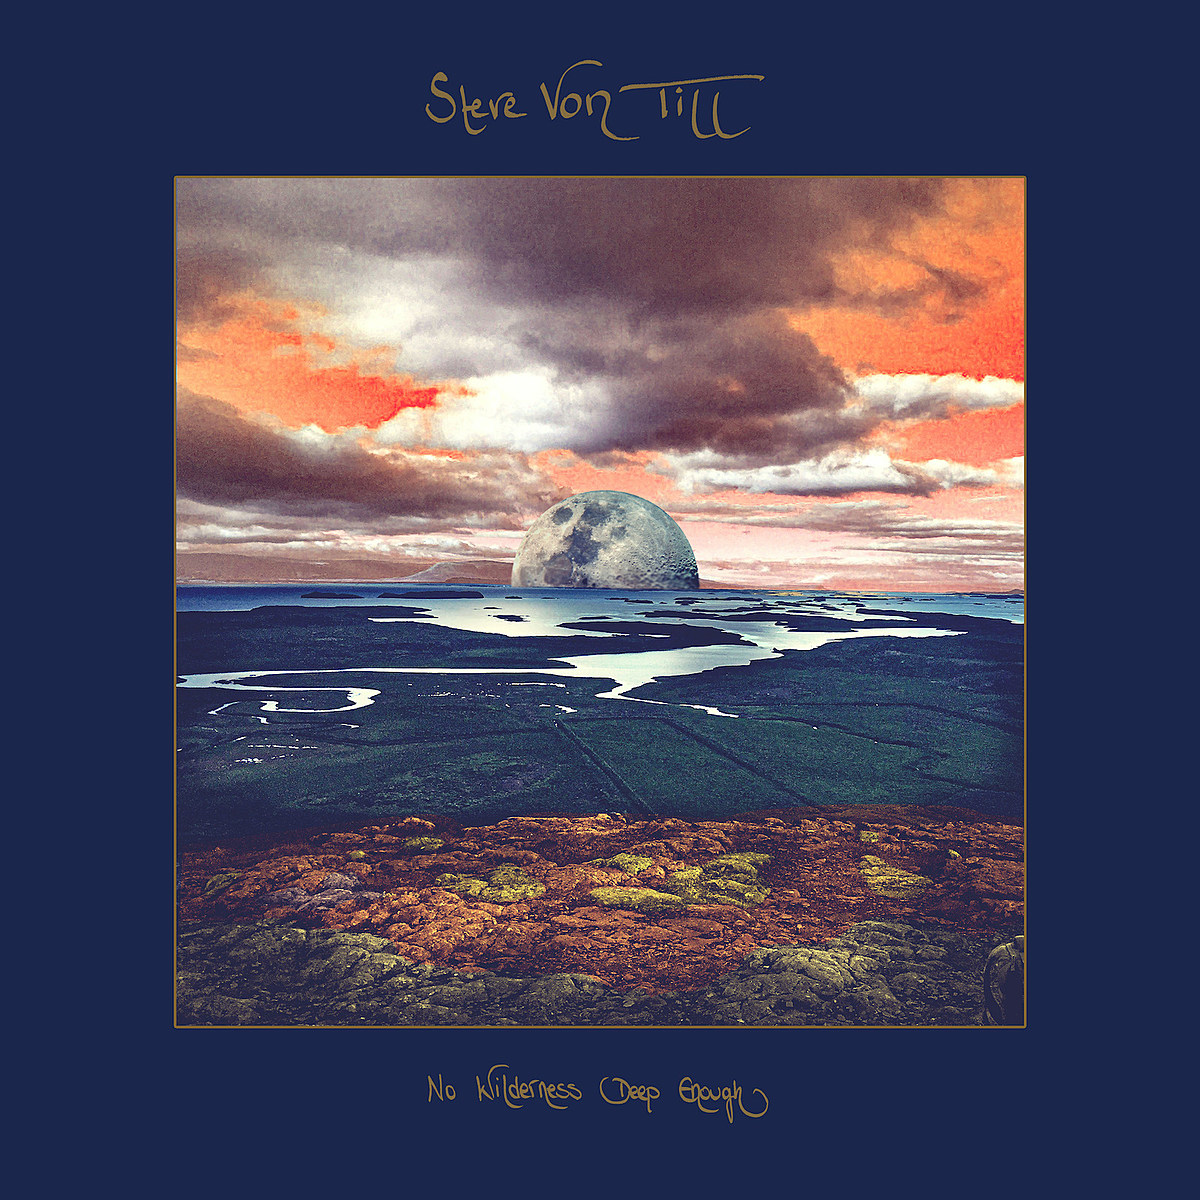 Neurosis' Steve Von Till announces new solo album & book, shares ...